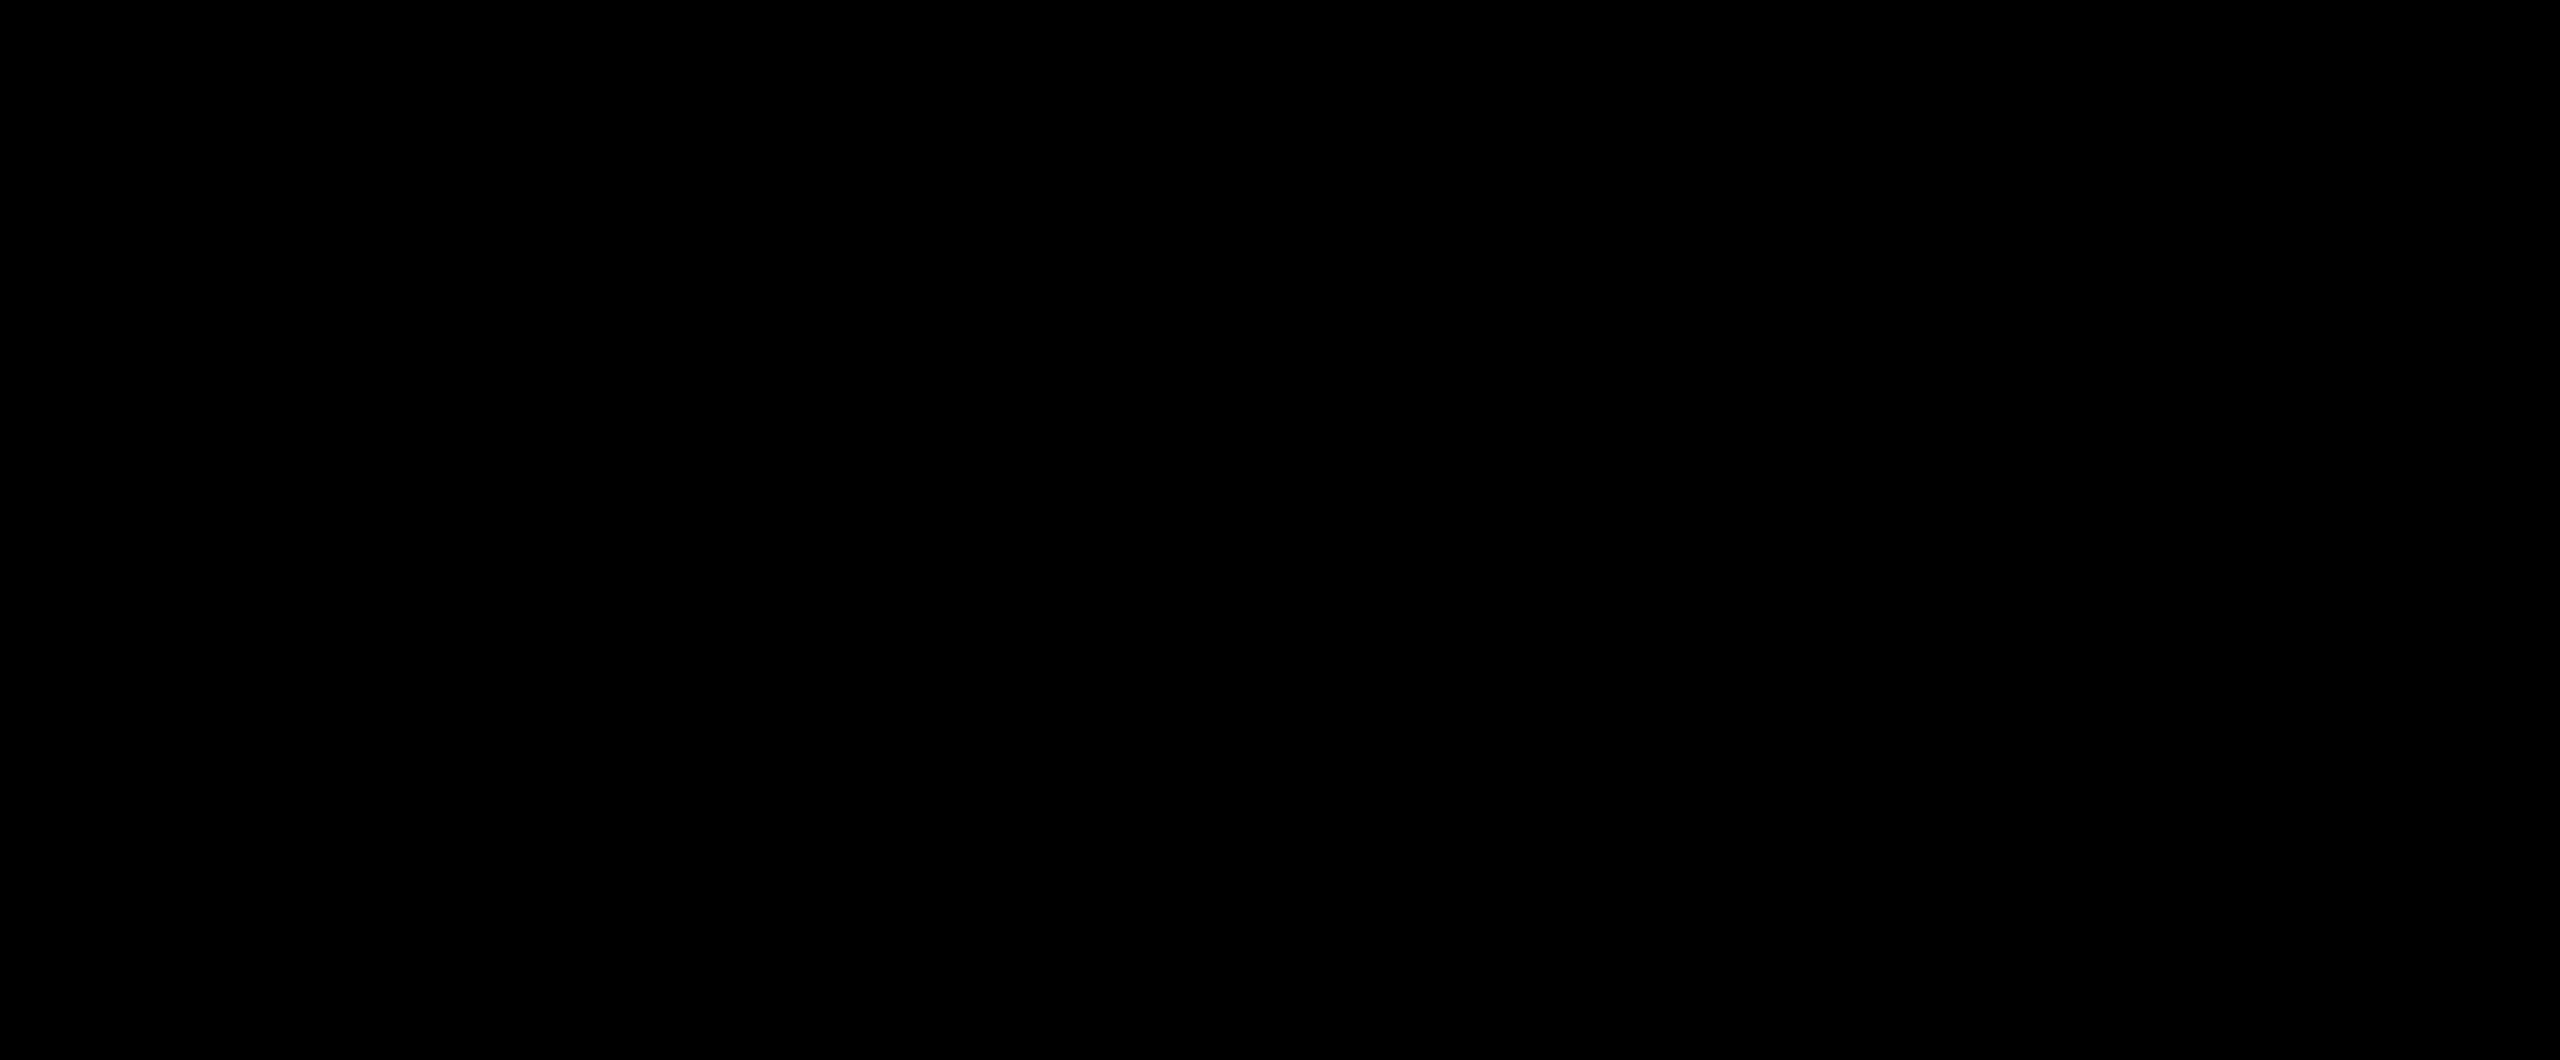 TOMASELLA – Anta Gola battente